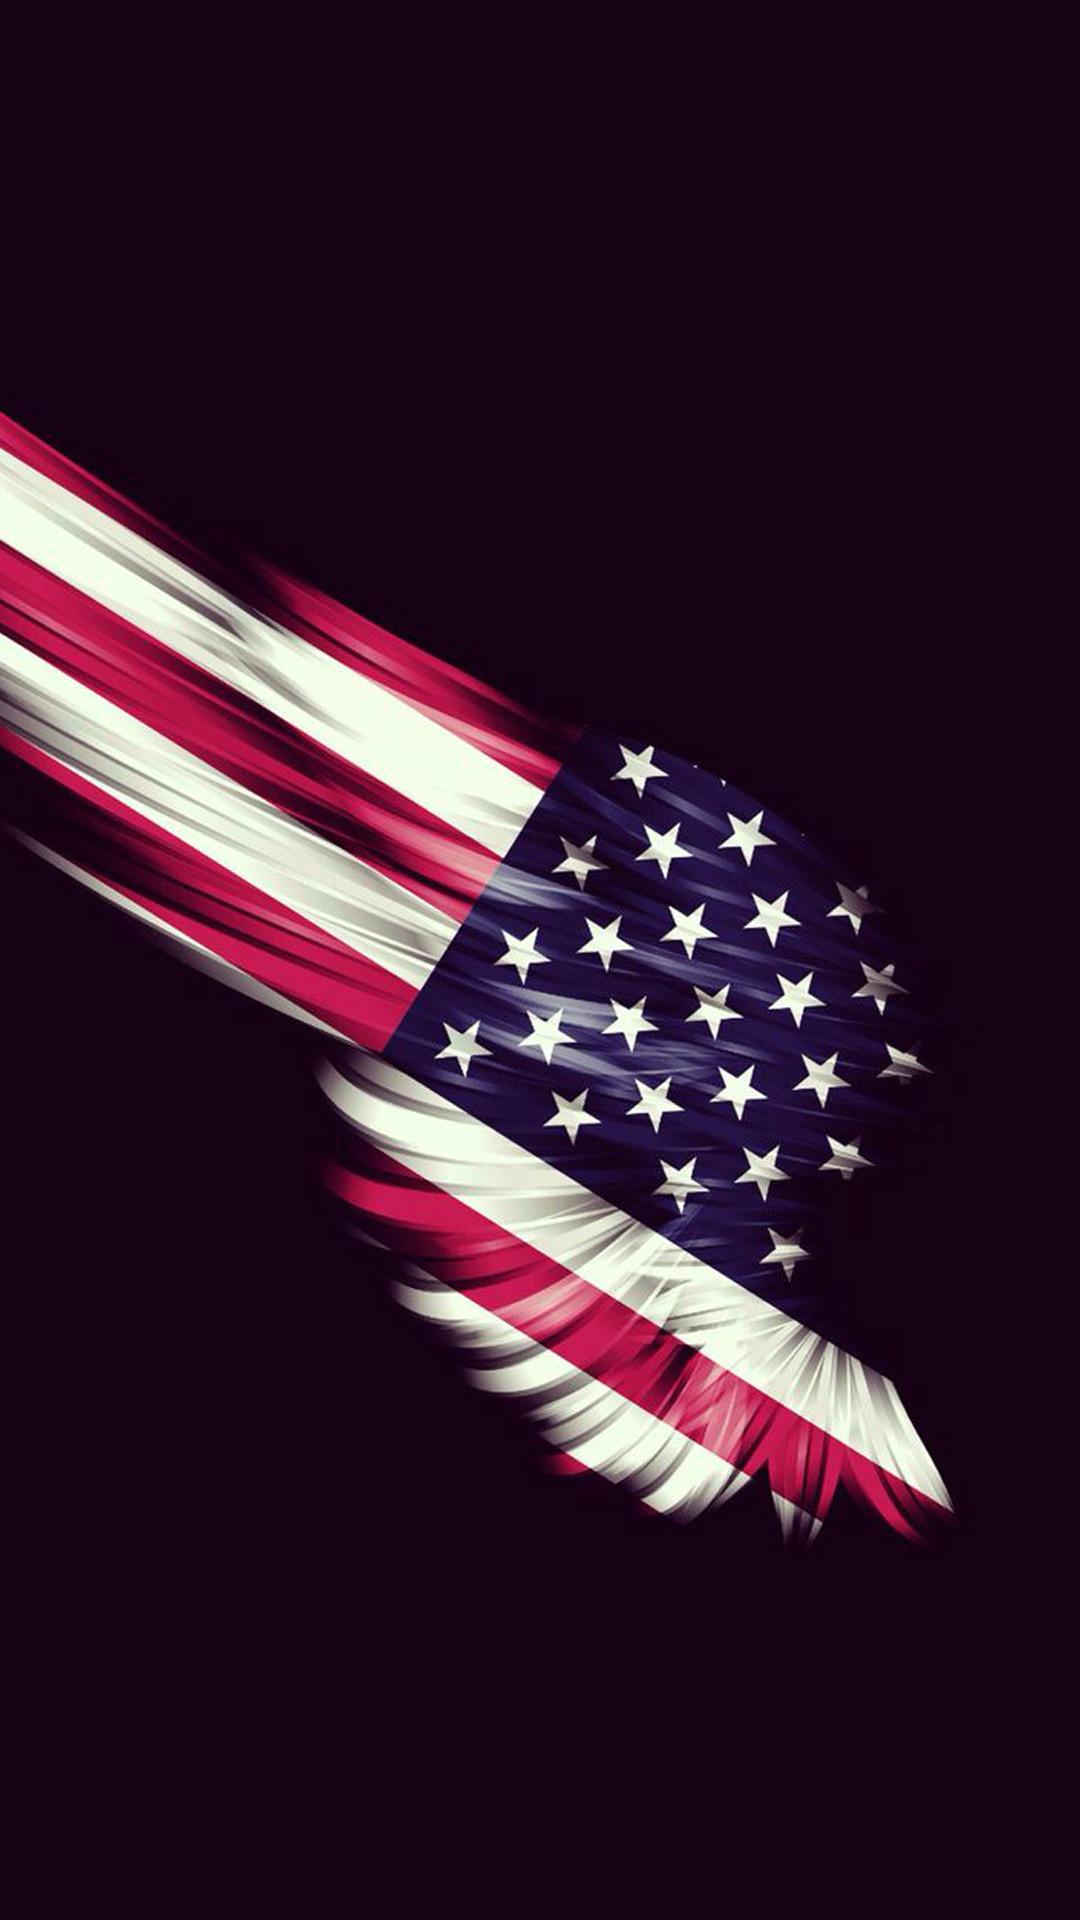 American Flag iphone 7 wallpaper